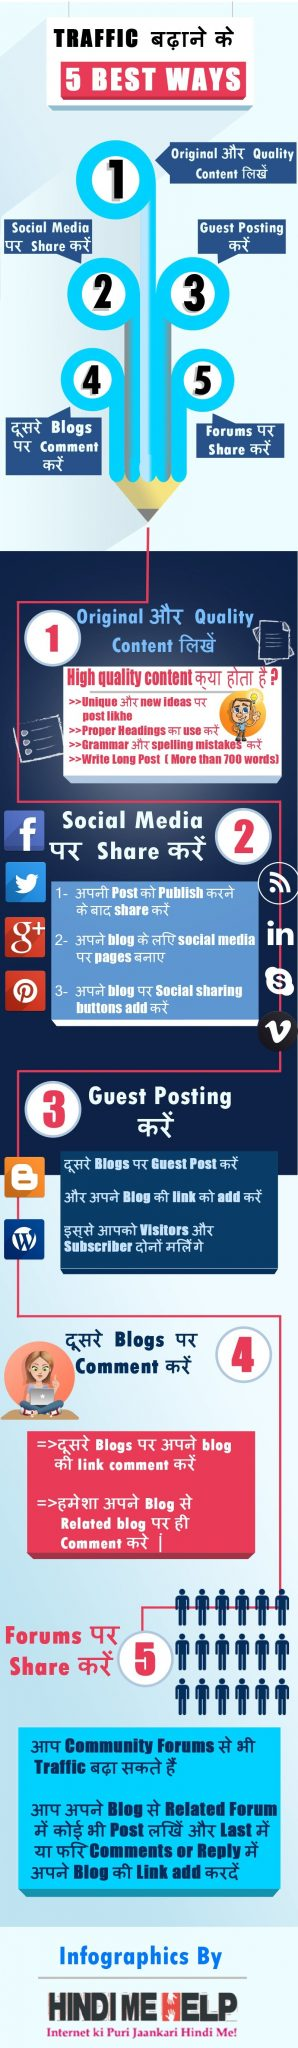 Website ki Traffic Badane ki 5 Tips Infographic in Hindi Hindi Me Help`